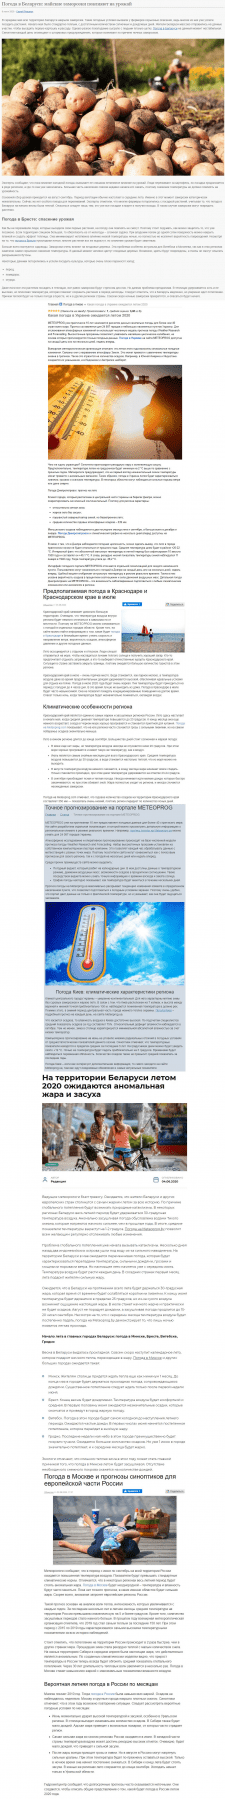 MIRALINKS | ПОГОДА, Meteoprog.ua